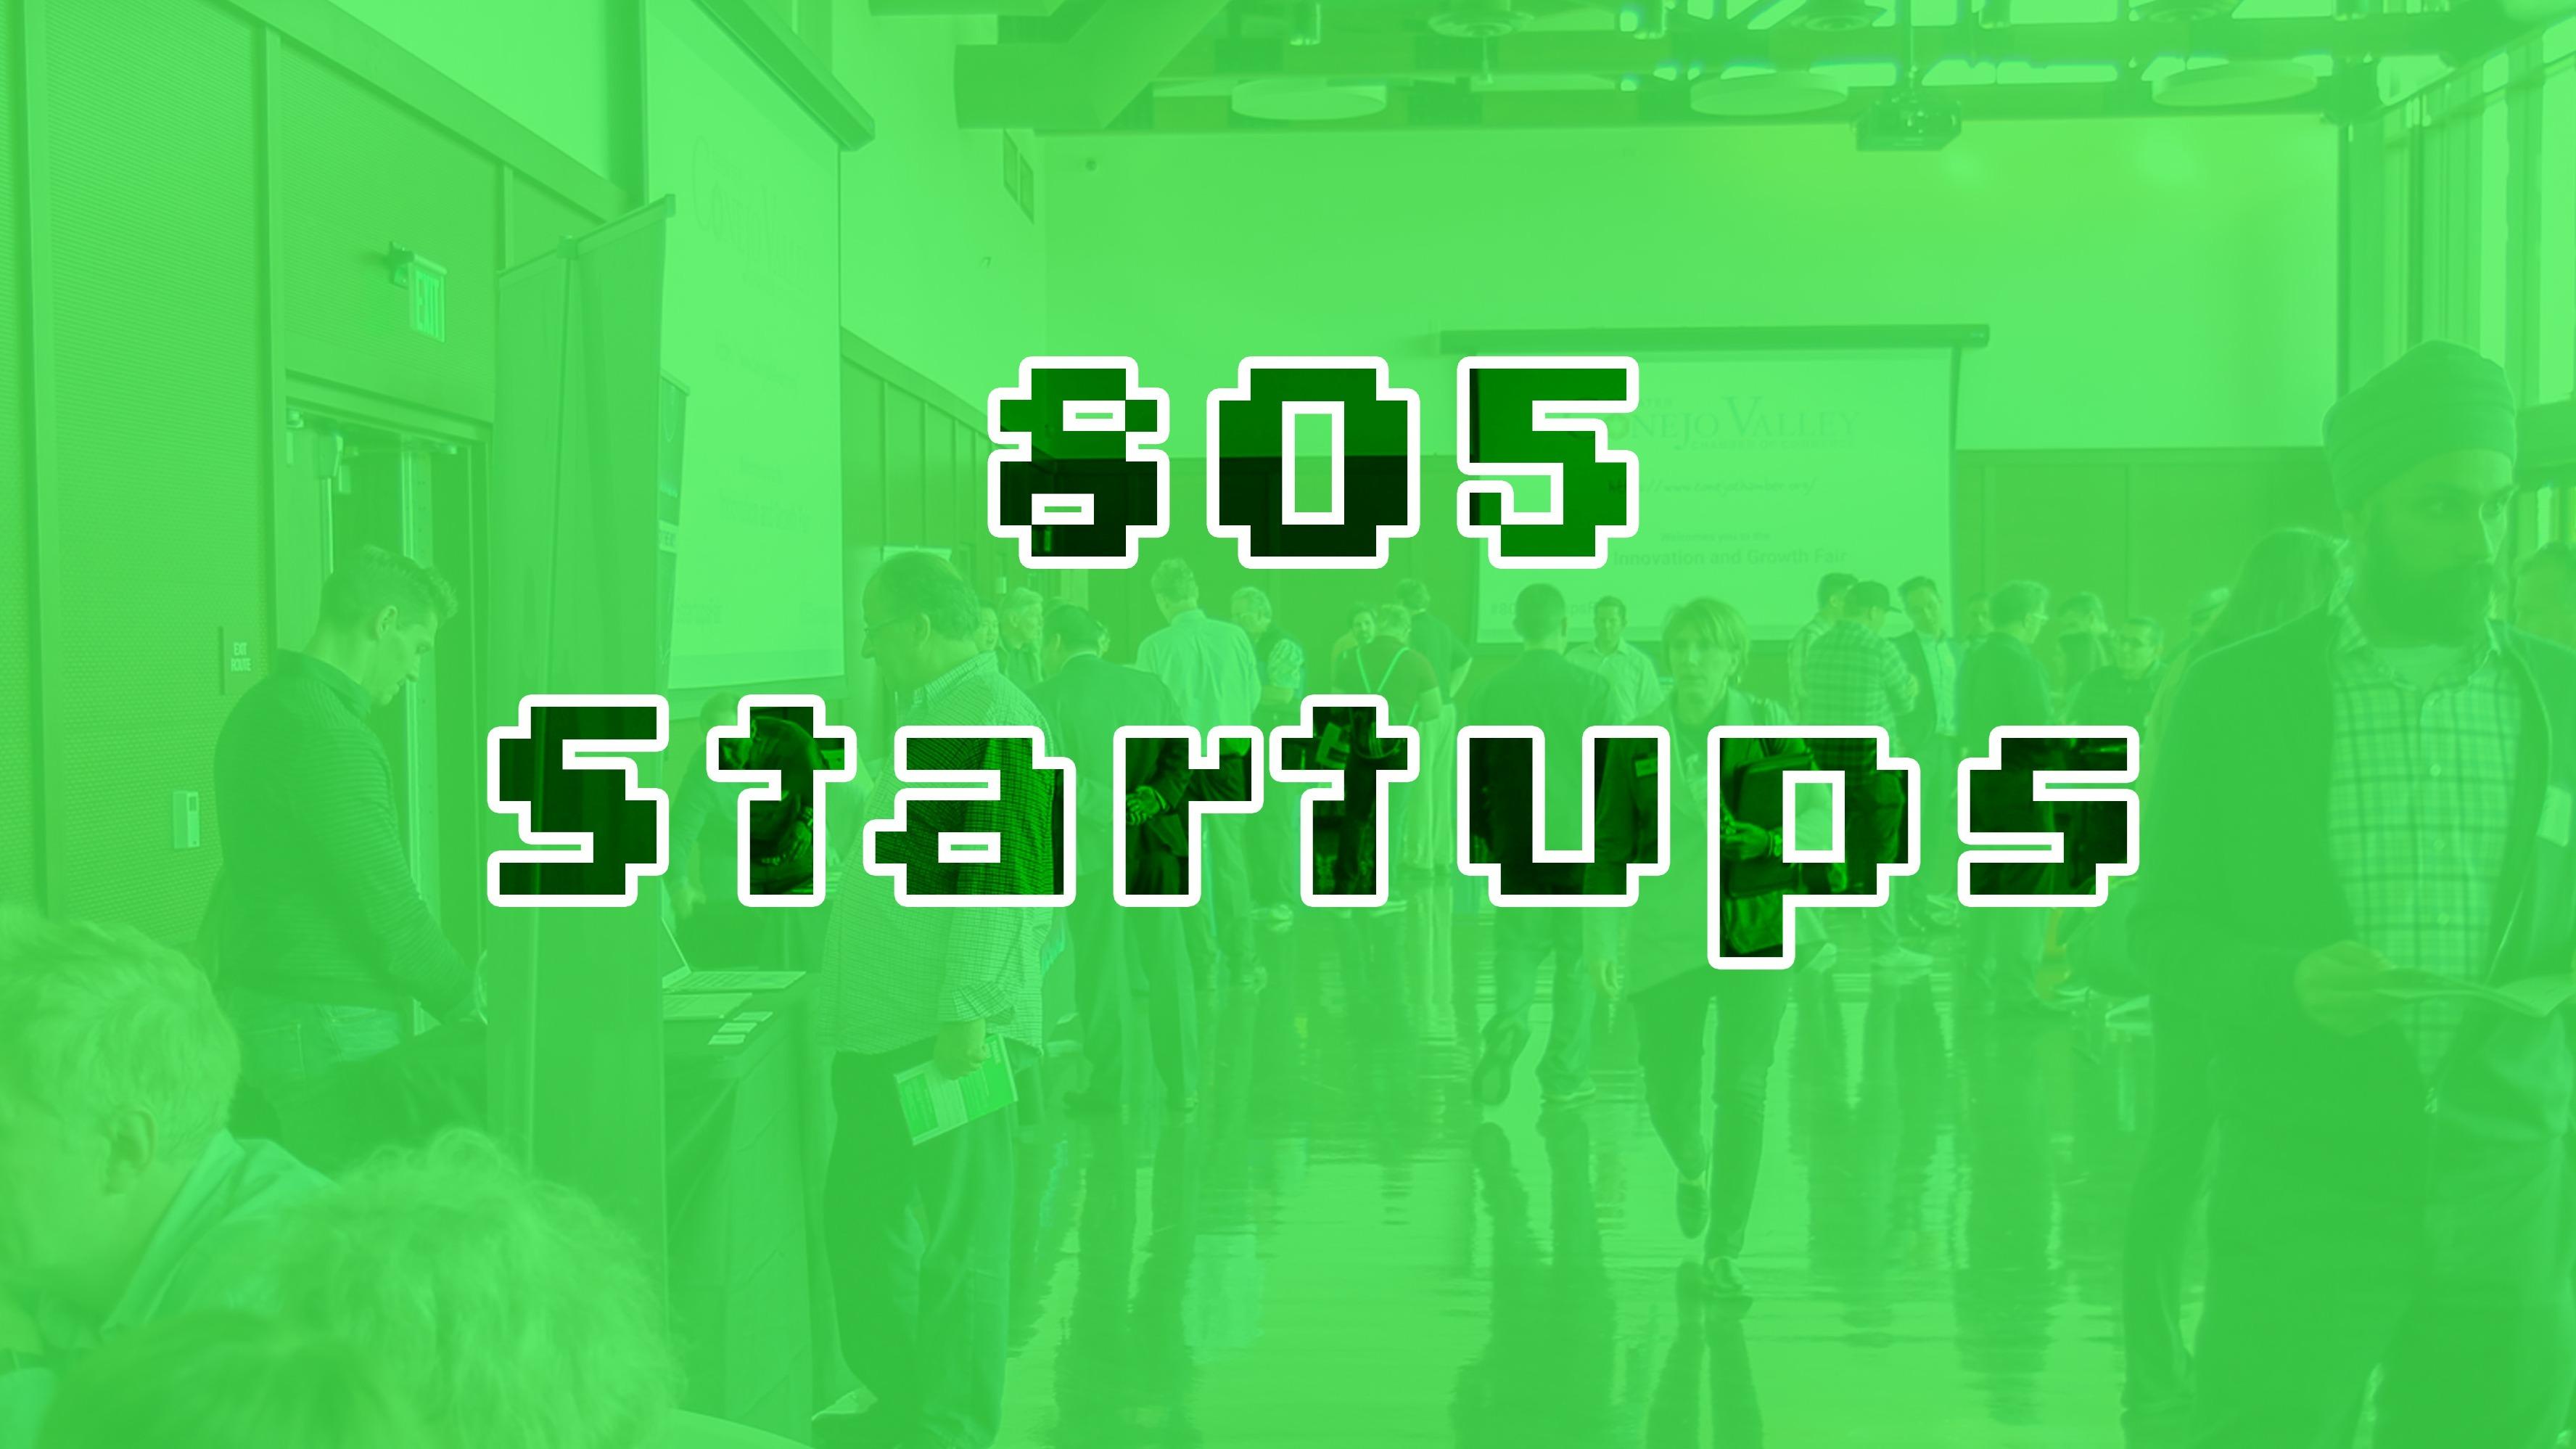 805 Startups - Techies, Entrepreneurs & Investors in the 805